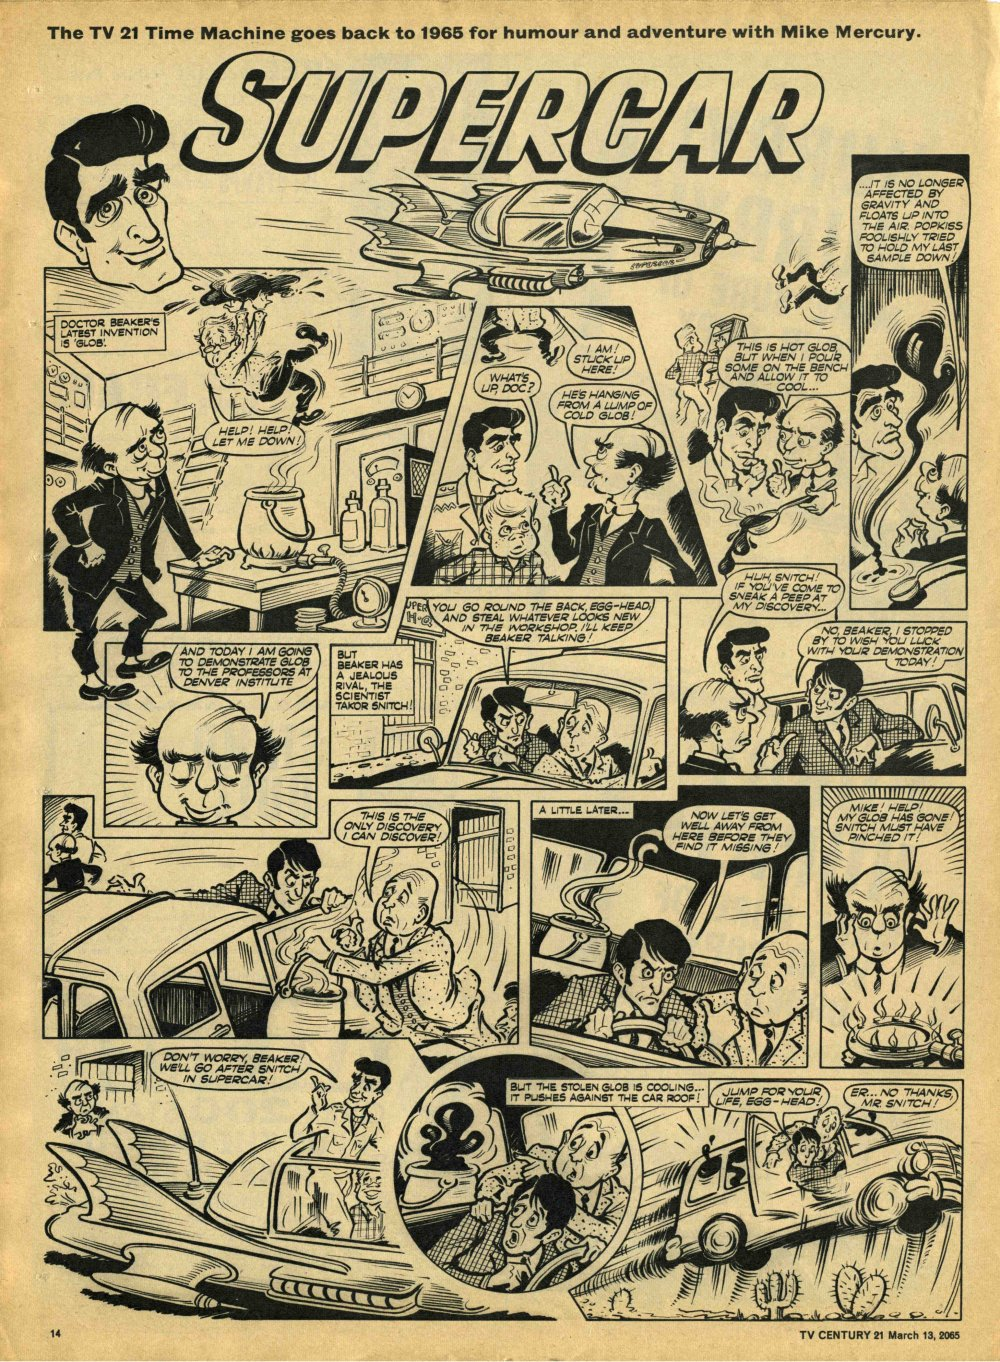 Read online TV Century 21 (TV 21) comic -  Issue #8 - 13